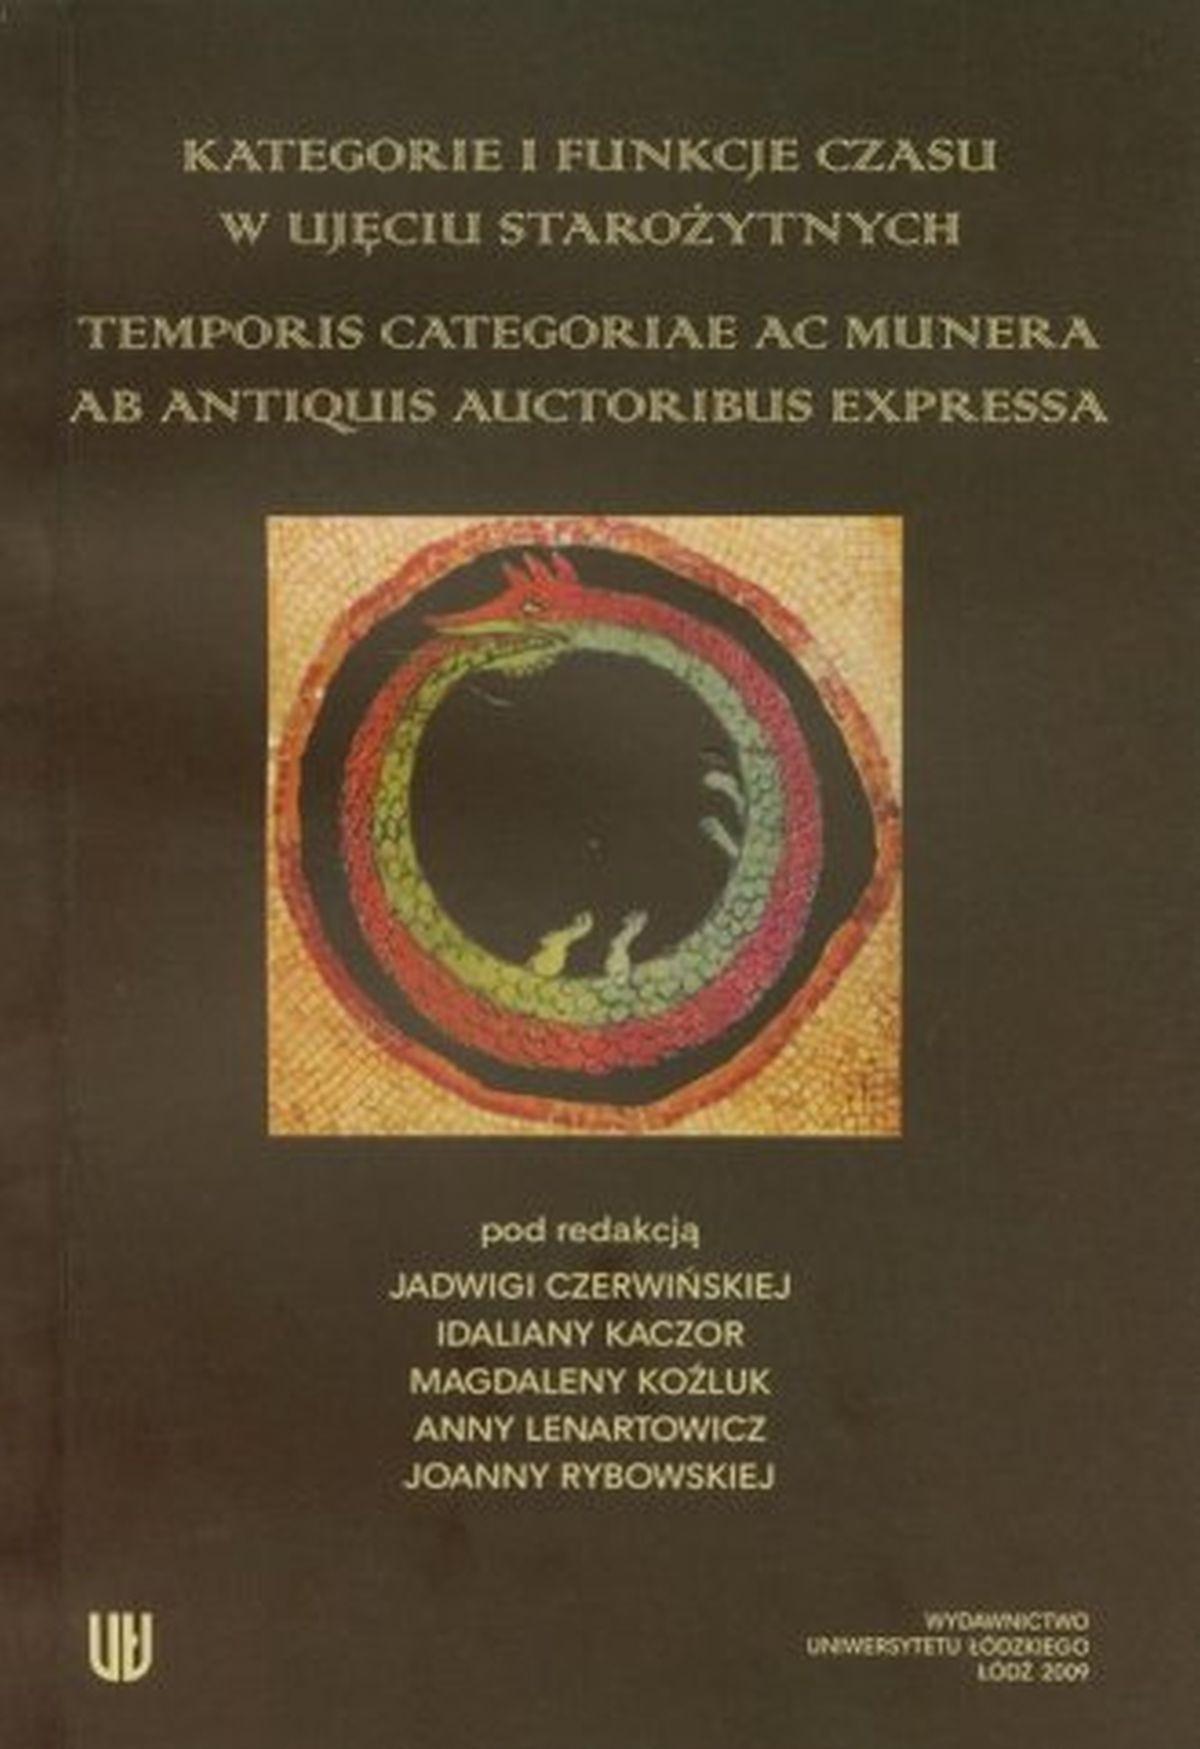 Kategorie i funkcje czasu w ujęciu starożytnych. Temporis categoriae ac munera ab antiquis auctoribus expressa